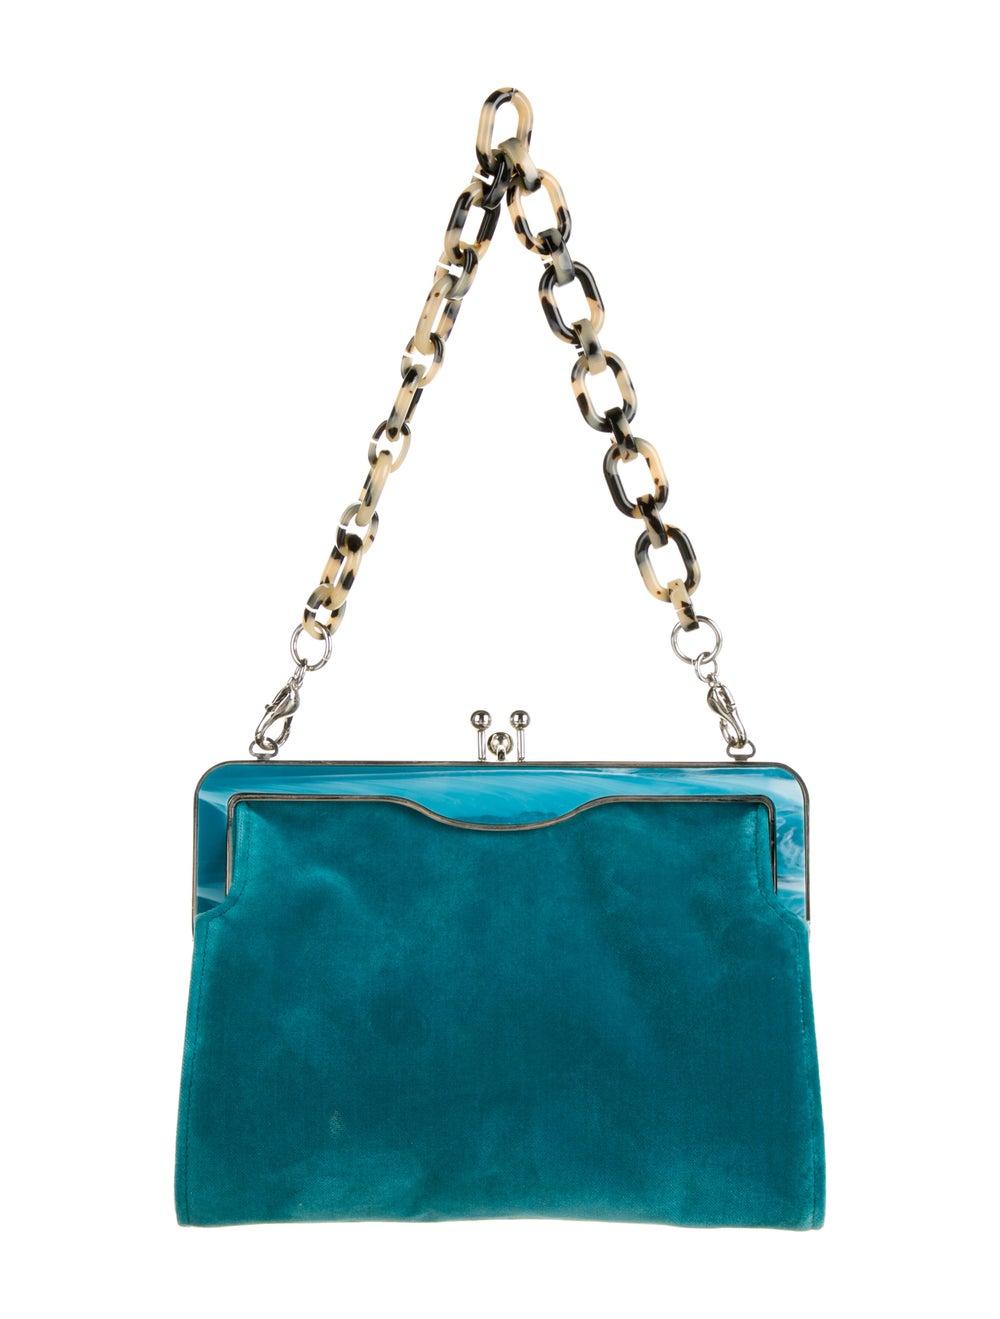 Edie Parker Velvet Handle Bag Green - image 4